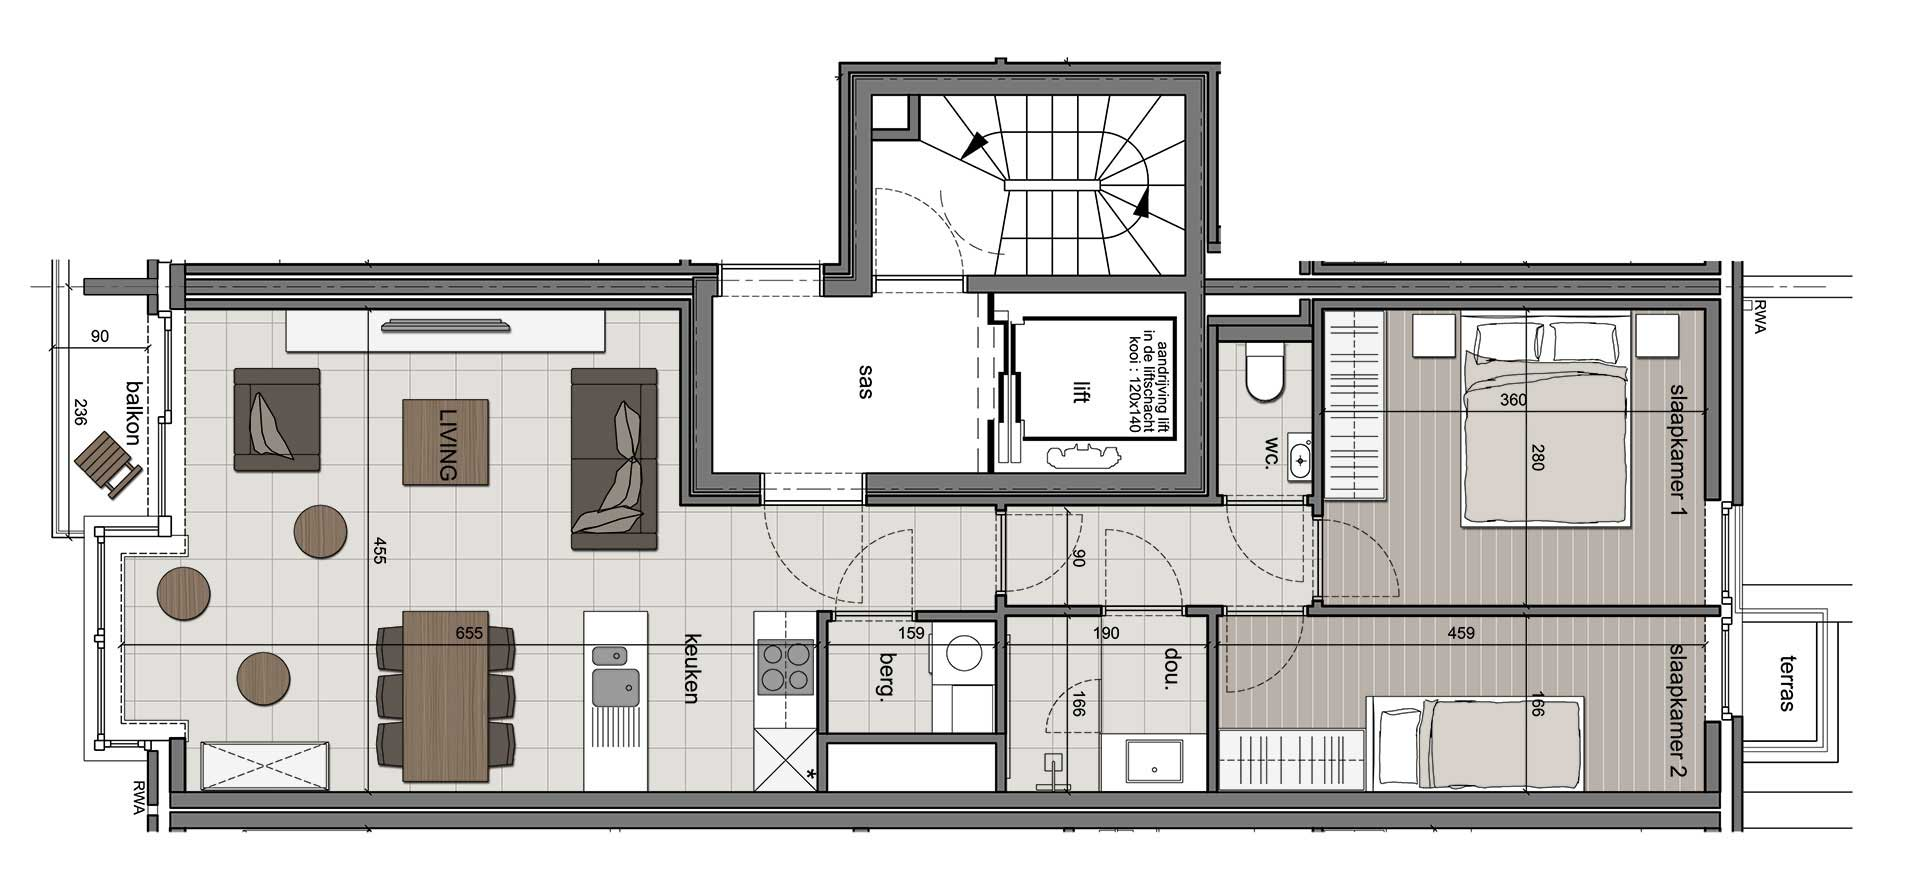 Residentie <br /> Winoc - image appartement-te-koop-koksijde-residentie-winoc-1.2 on https://hoprom.be